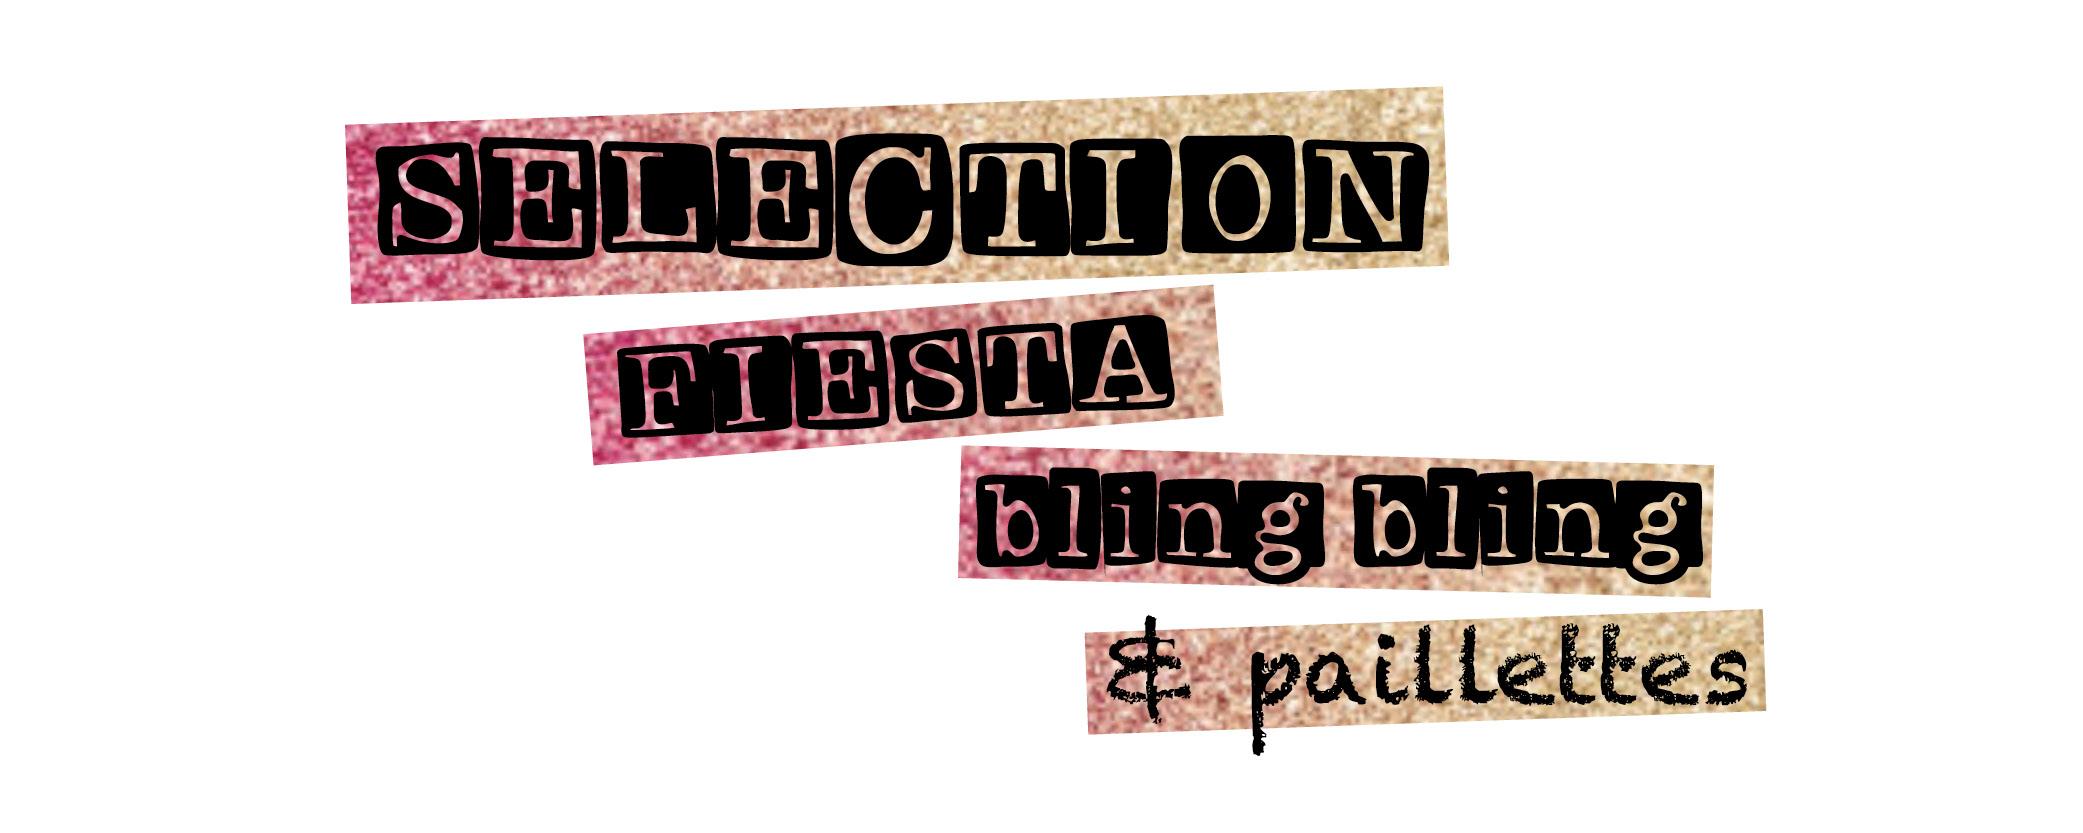 SELECTION FETES 2018